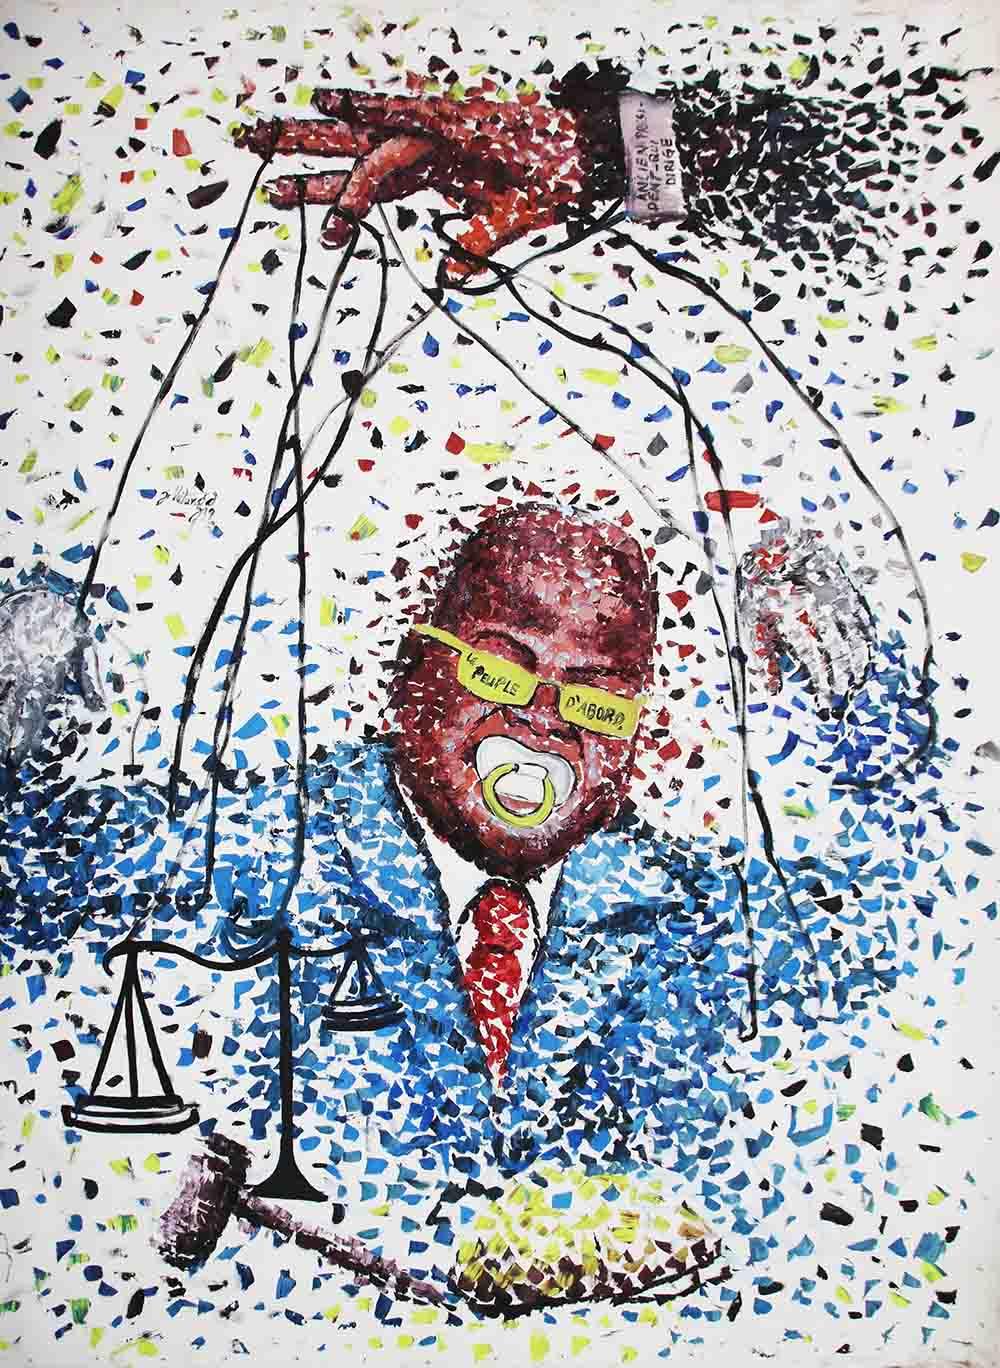 Jonathan Vatunga, 2019, mixed media on canvas, approx 150 x 148 cm